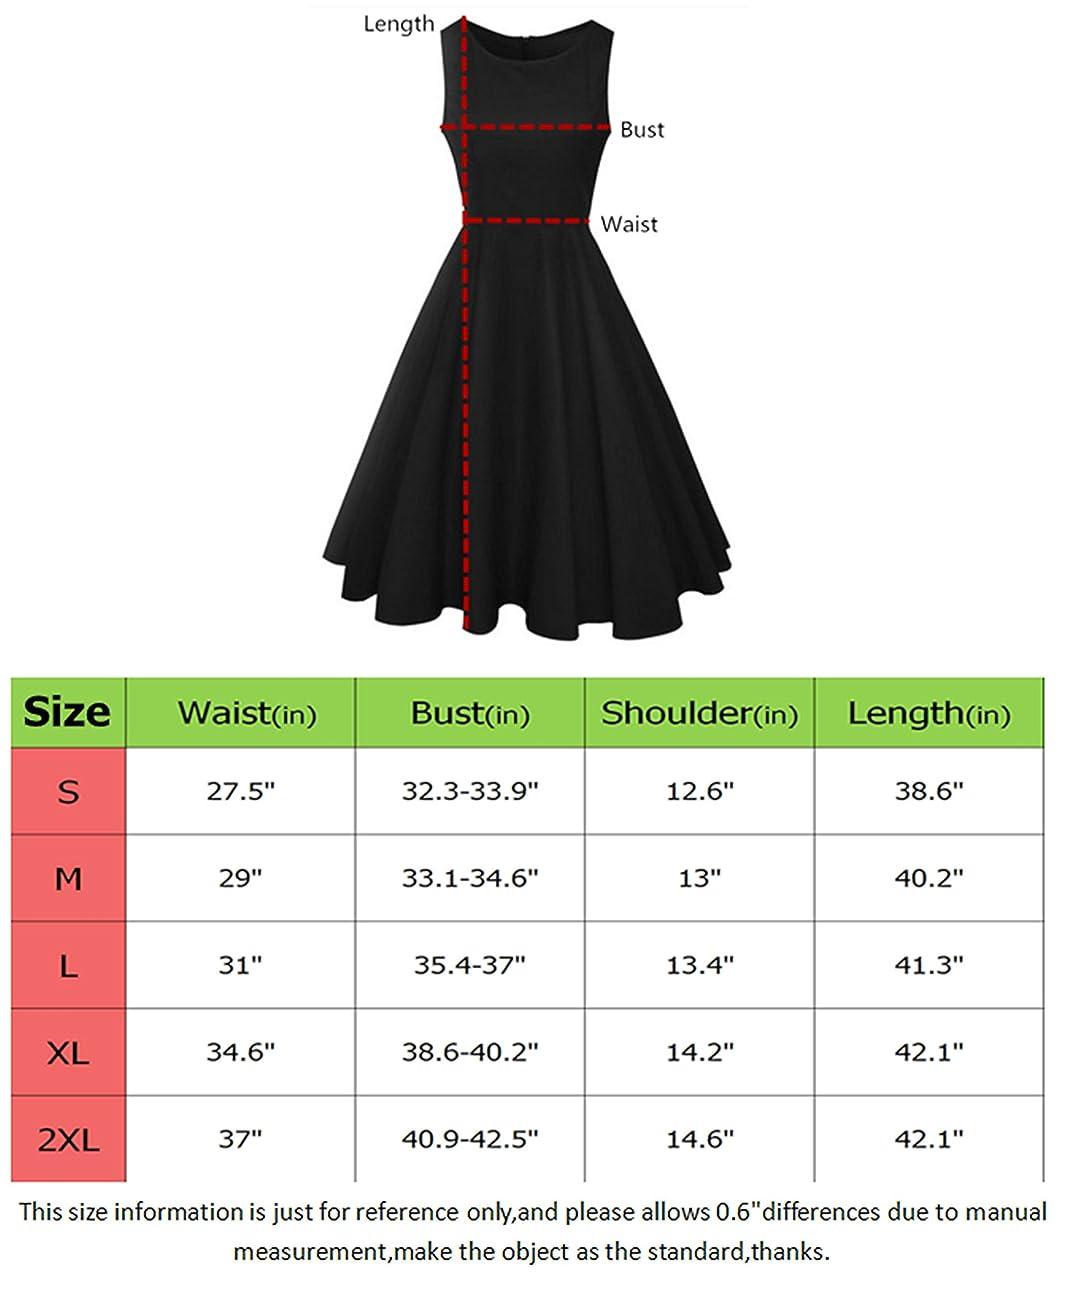 NINEWE Women's Classy Audrey Hepburn 1950s Vintage Rockabilly Swing Dress 3